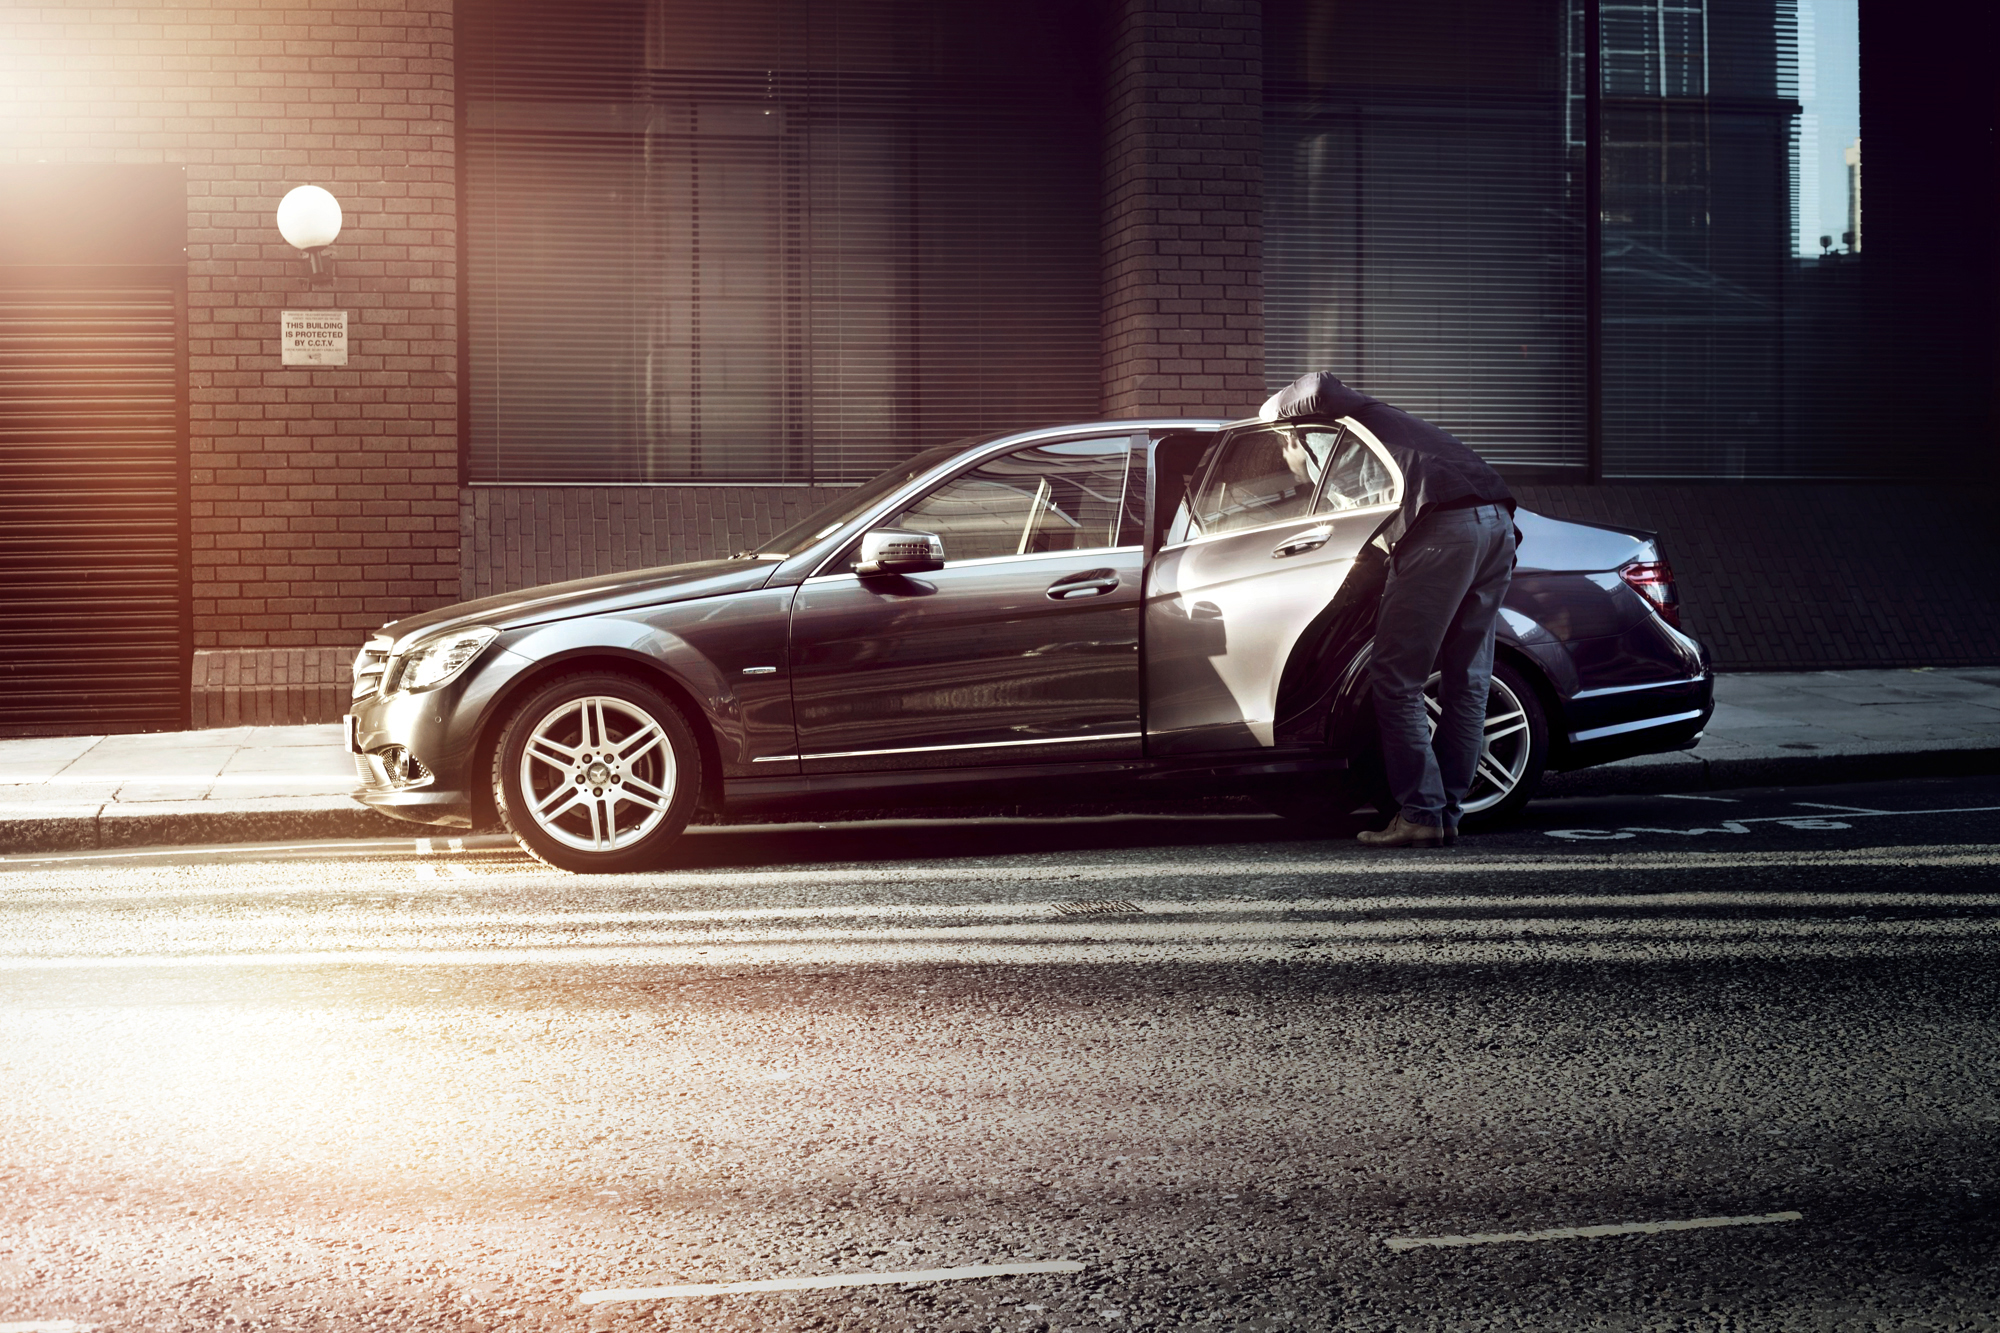 Mercedes_a_day_in_london_heandme_004